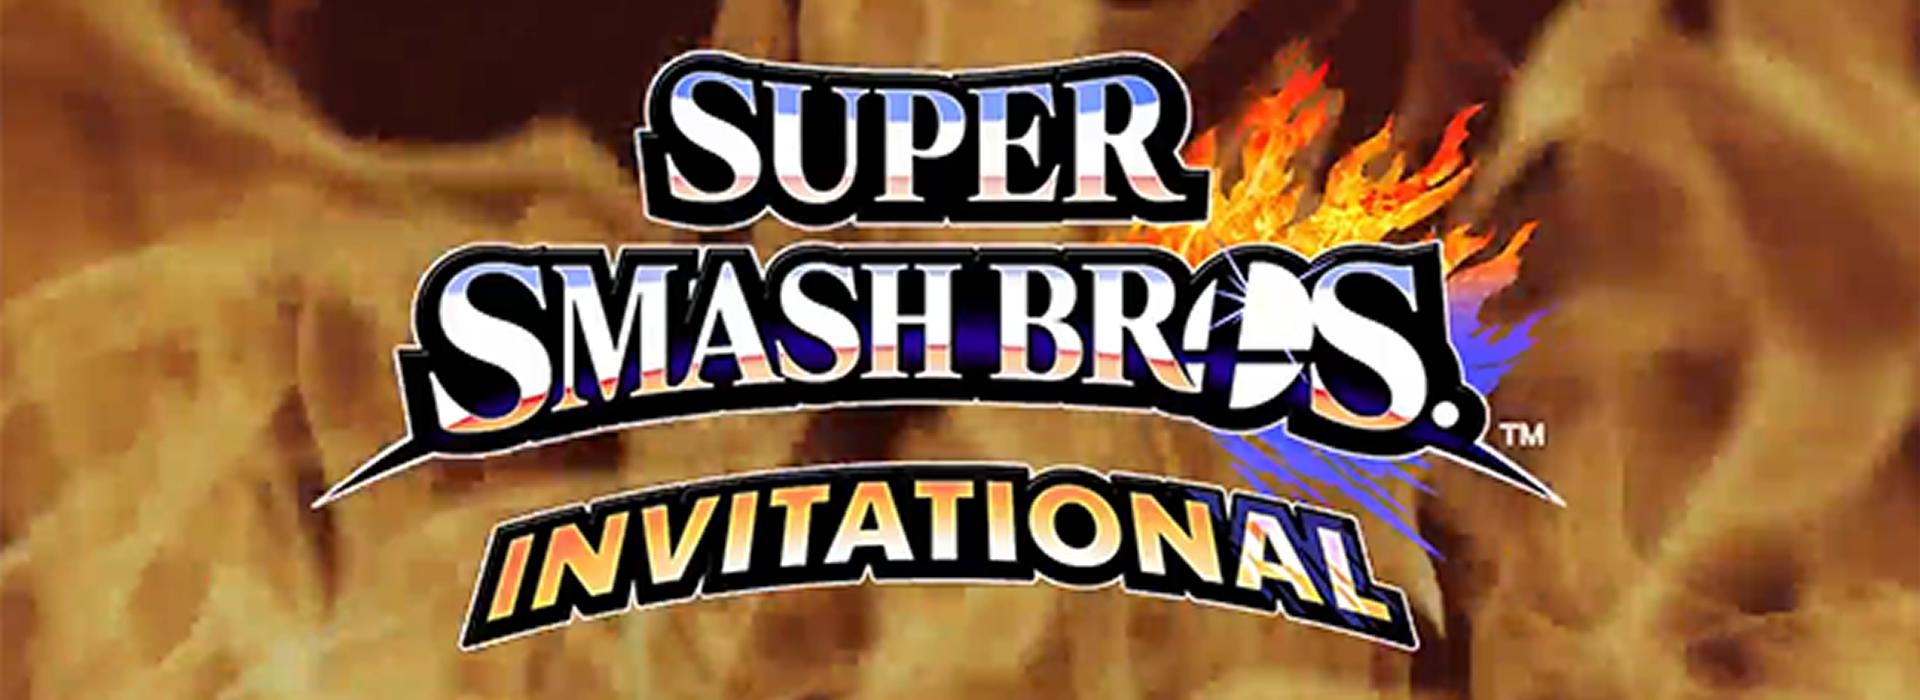 Smash Bros. Invitational Banner